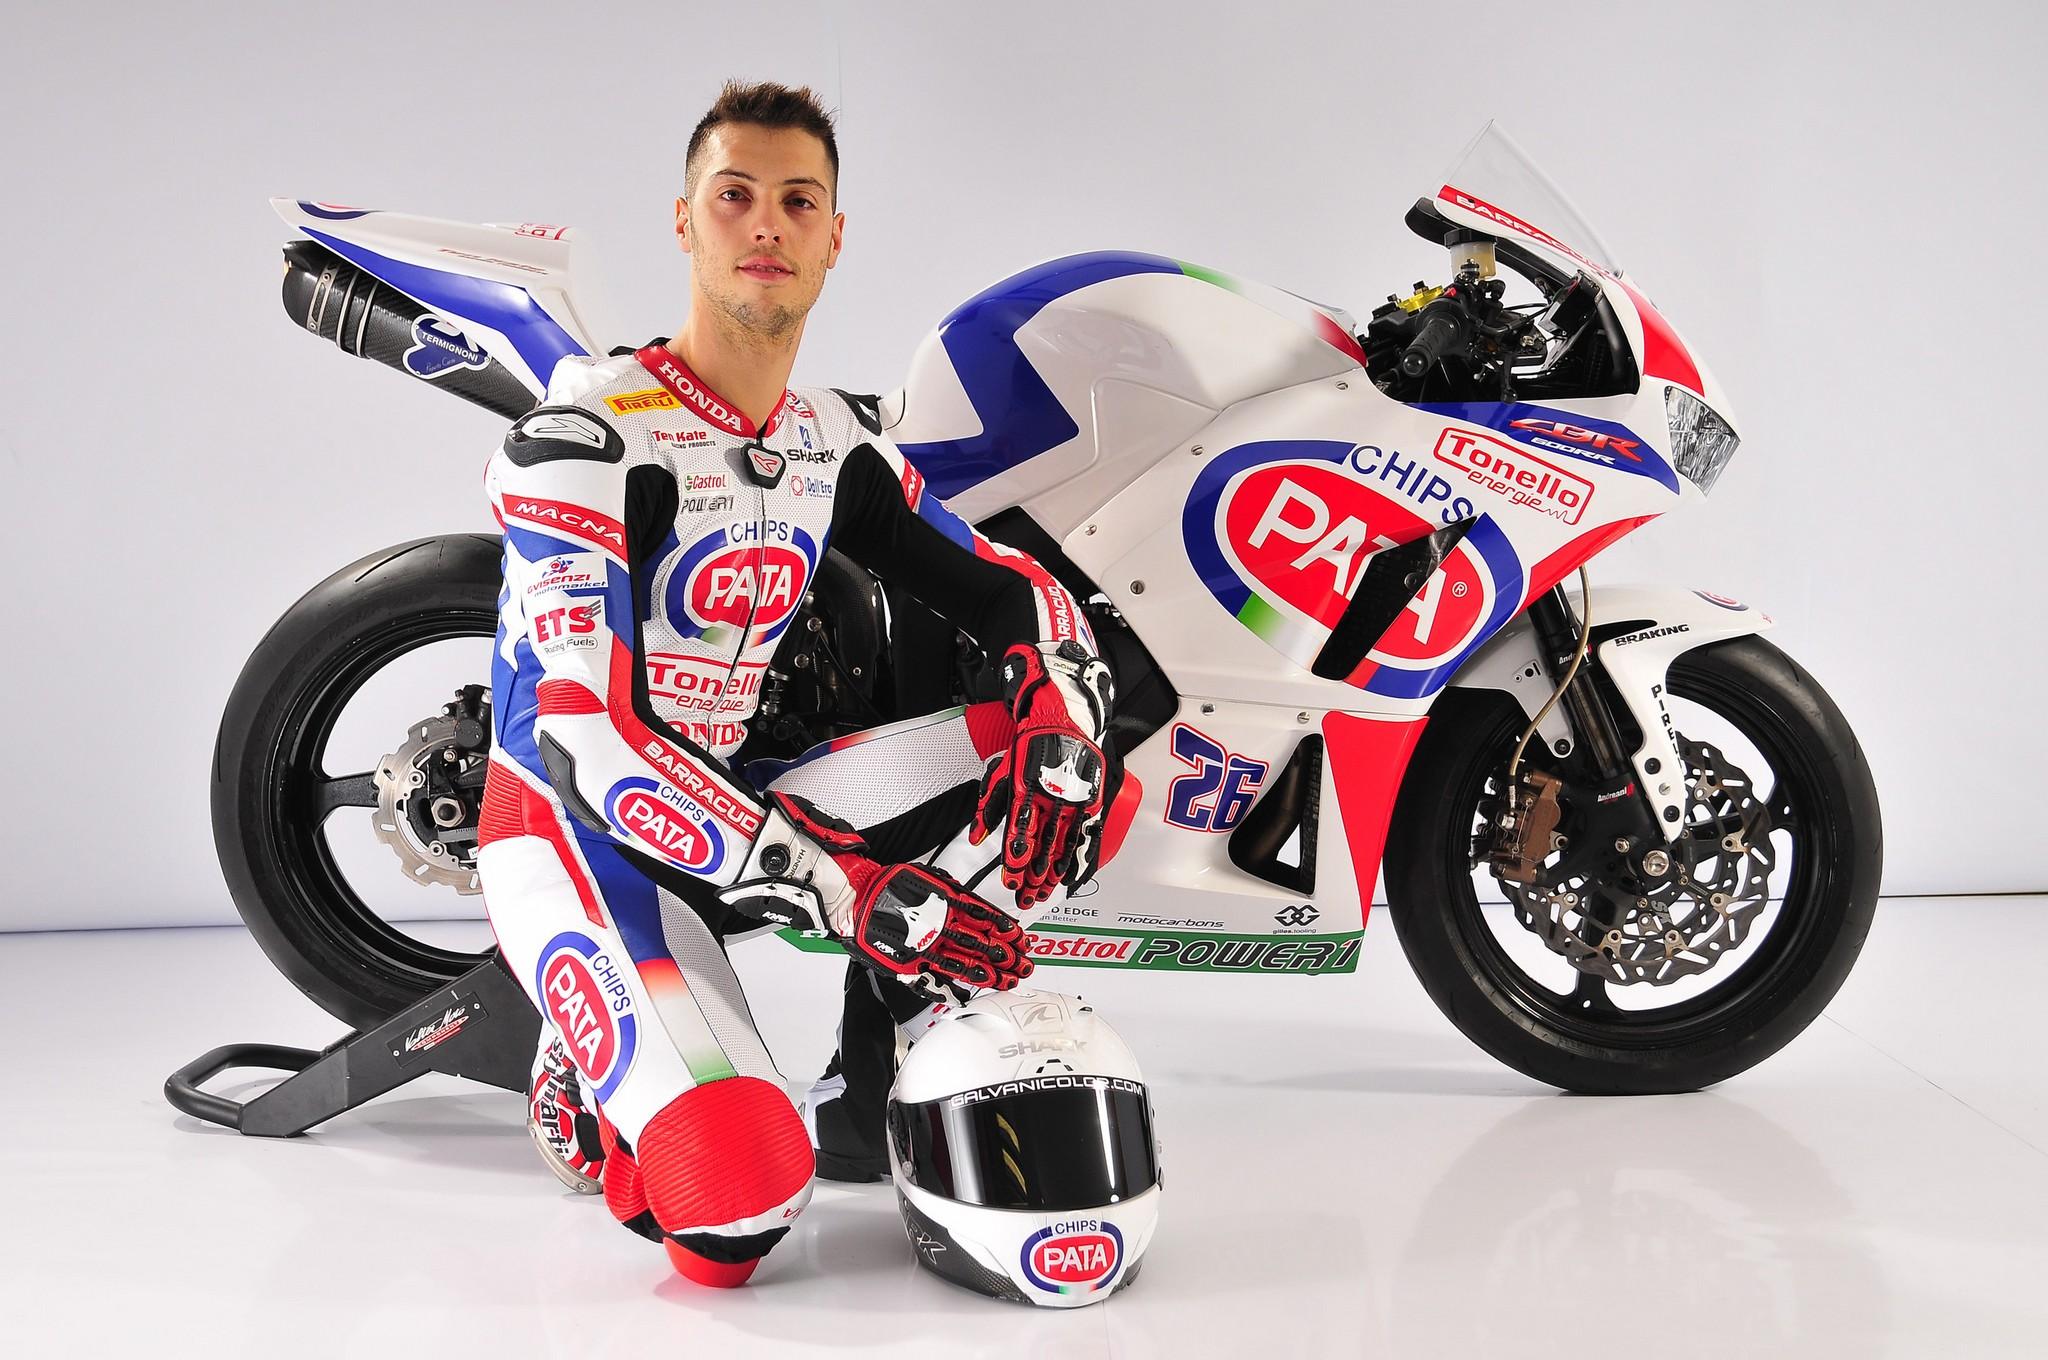 Pata Honda 2014 World Superbike And Supersport Team